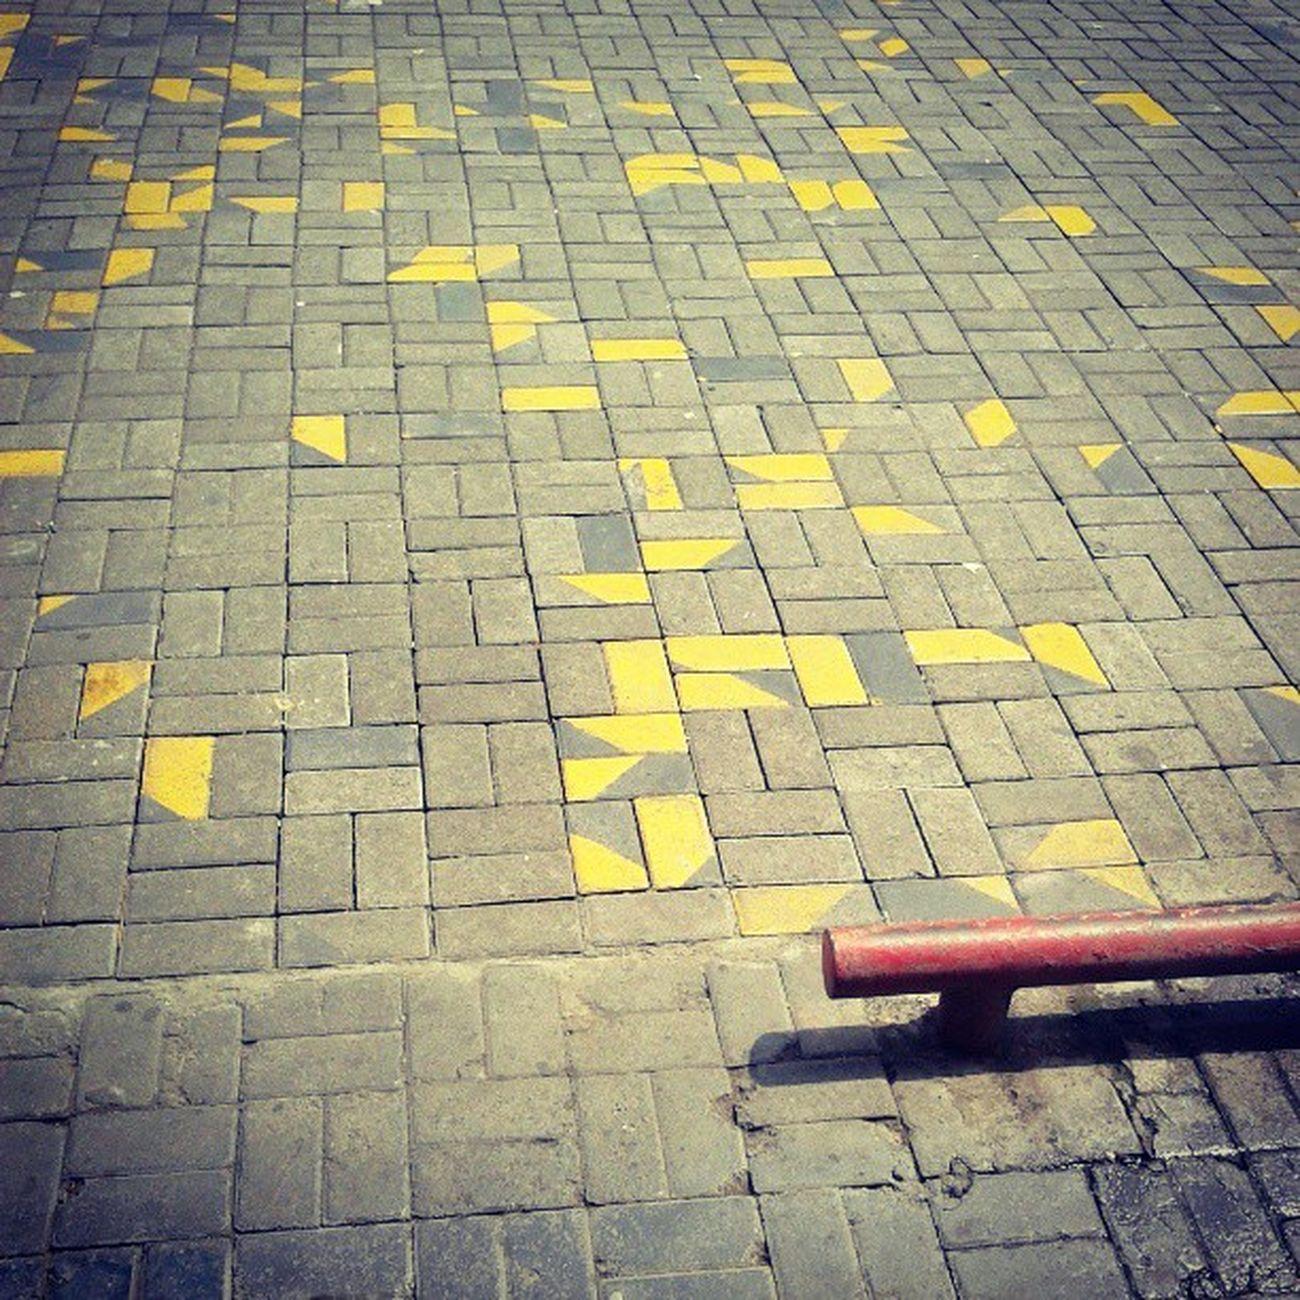 geometric yellow Street Streetphoto Yellow Red Rusty Picoftheday Photooftheday Instanusantarabali Instanusantara Instanesia Instadaily Instagood IGDaily Igers Concrete Bali INDONESIA LangitbaliPhotoworks